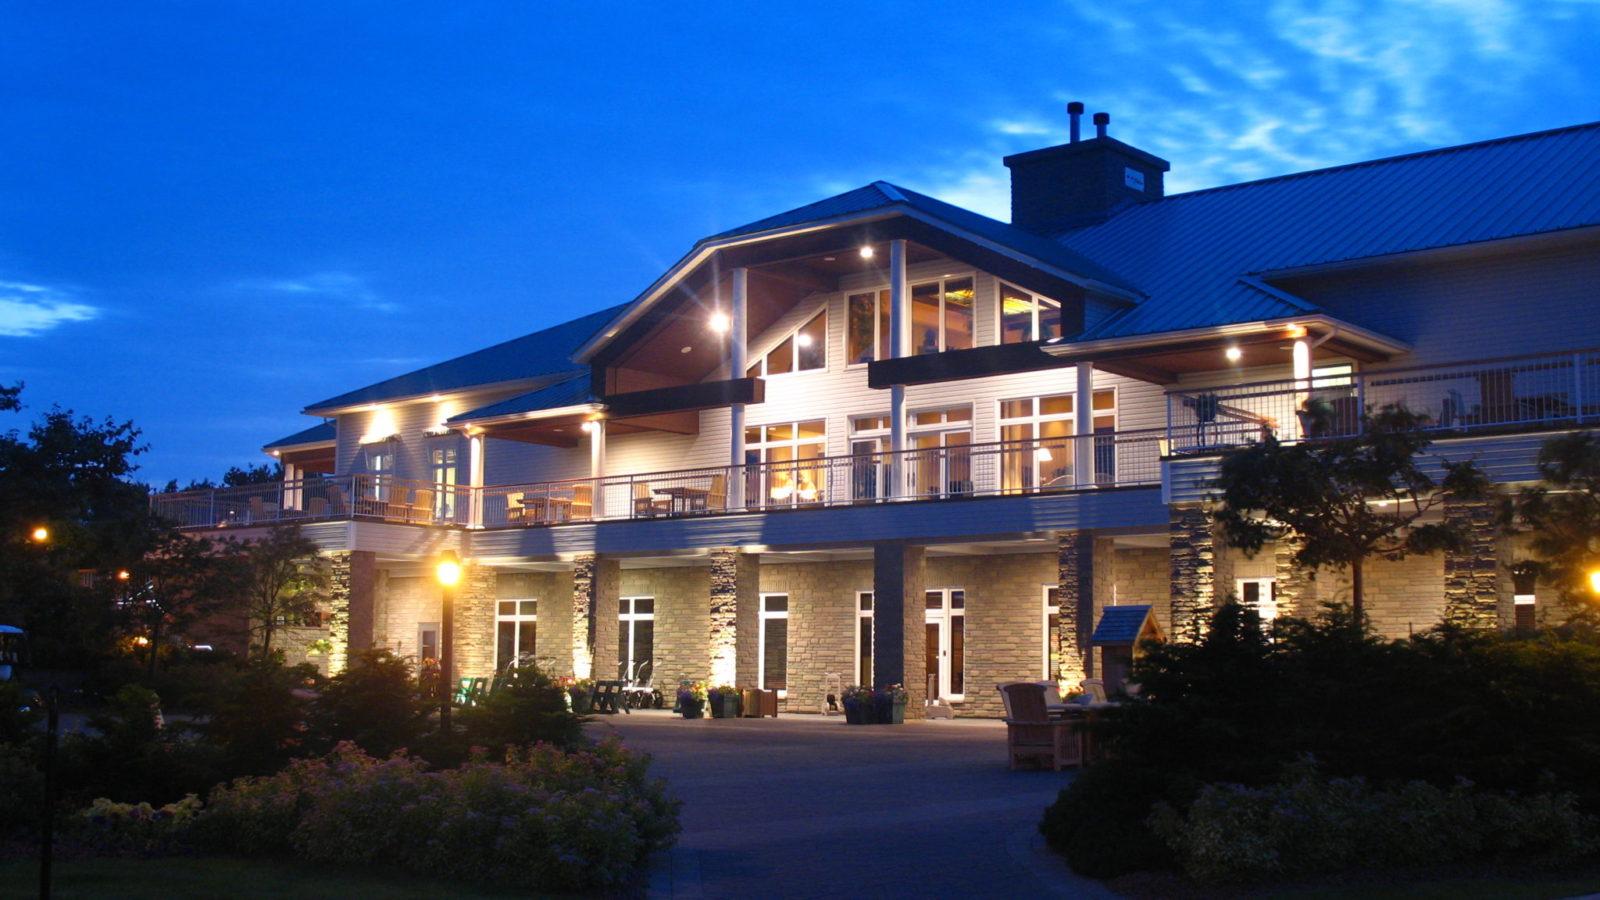 fox-harbr-resort-clubhouse-exterior-night_27275506919_o